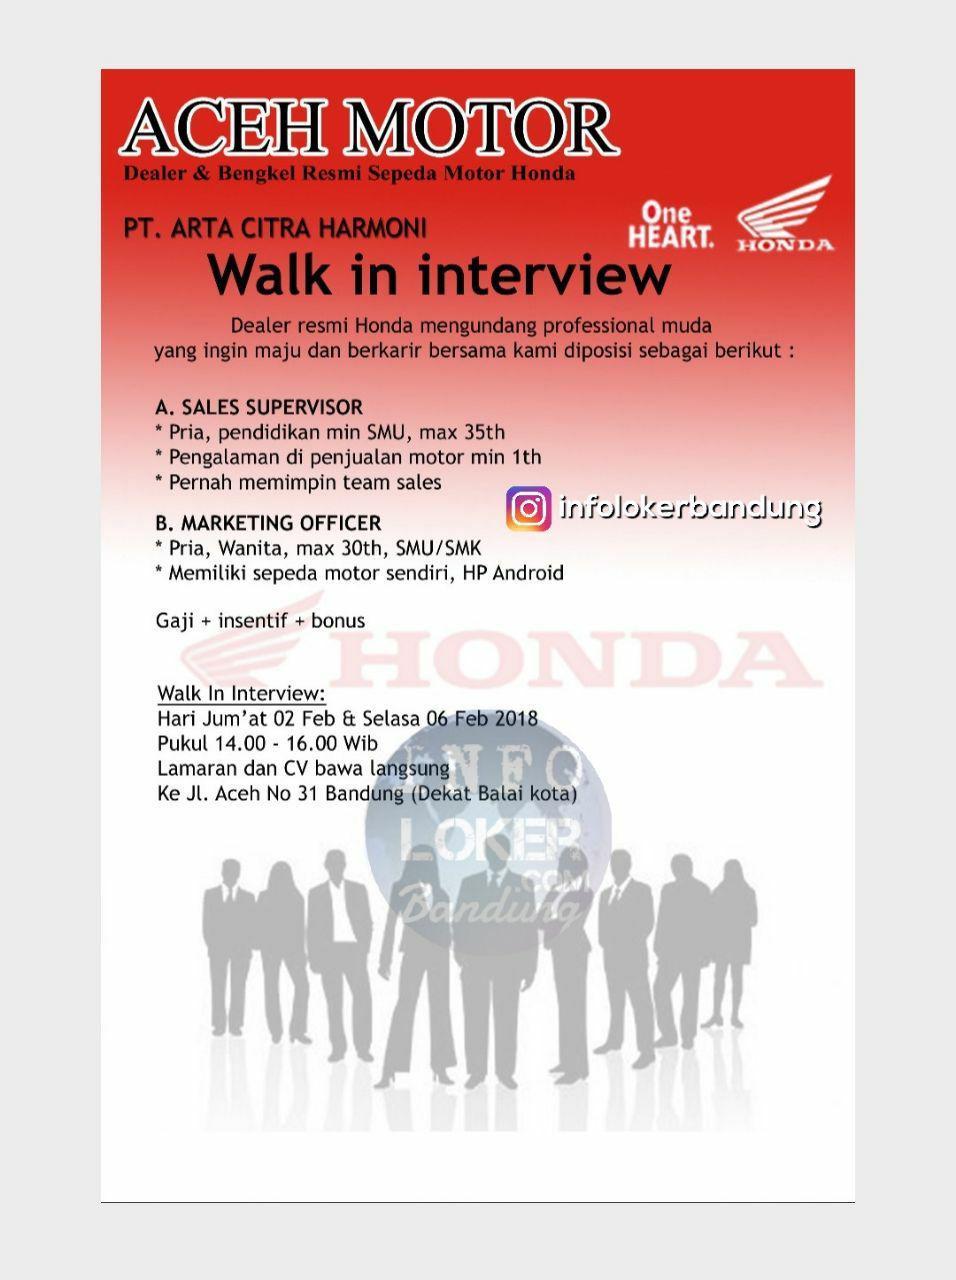 Walk In Interview Aceh Motor Bandung 02  & 06 Februari 2018